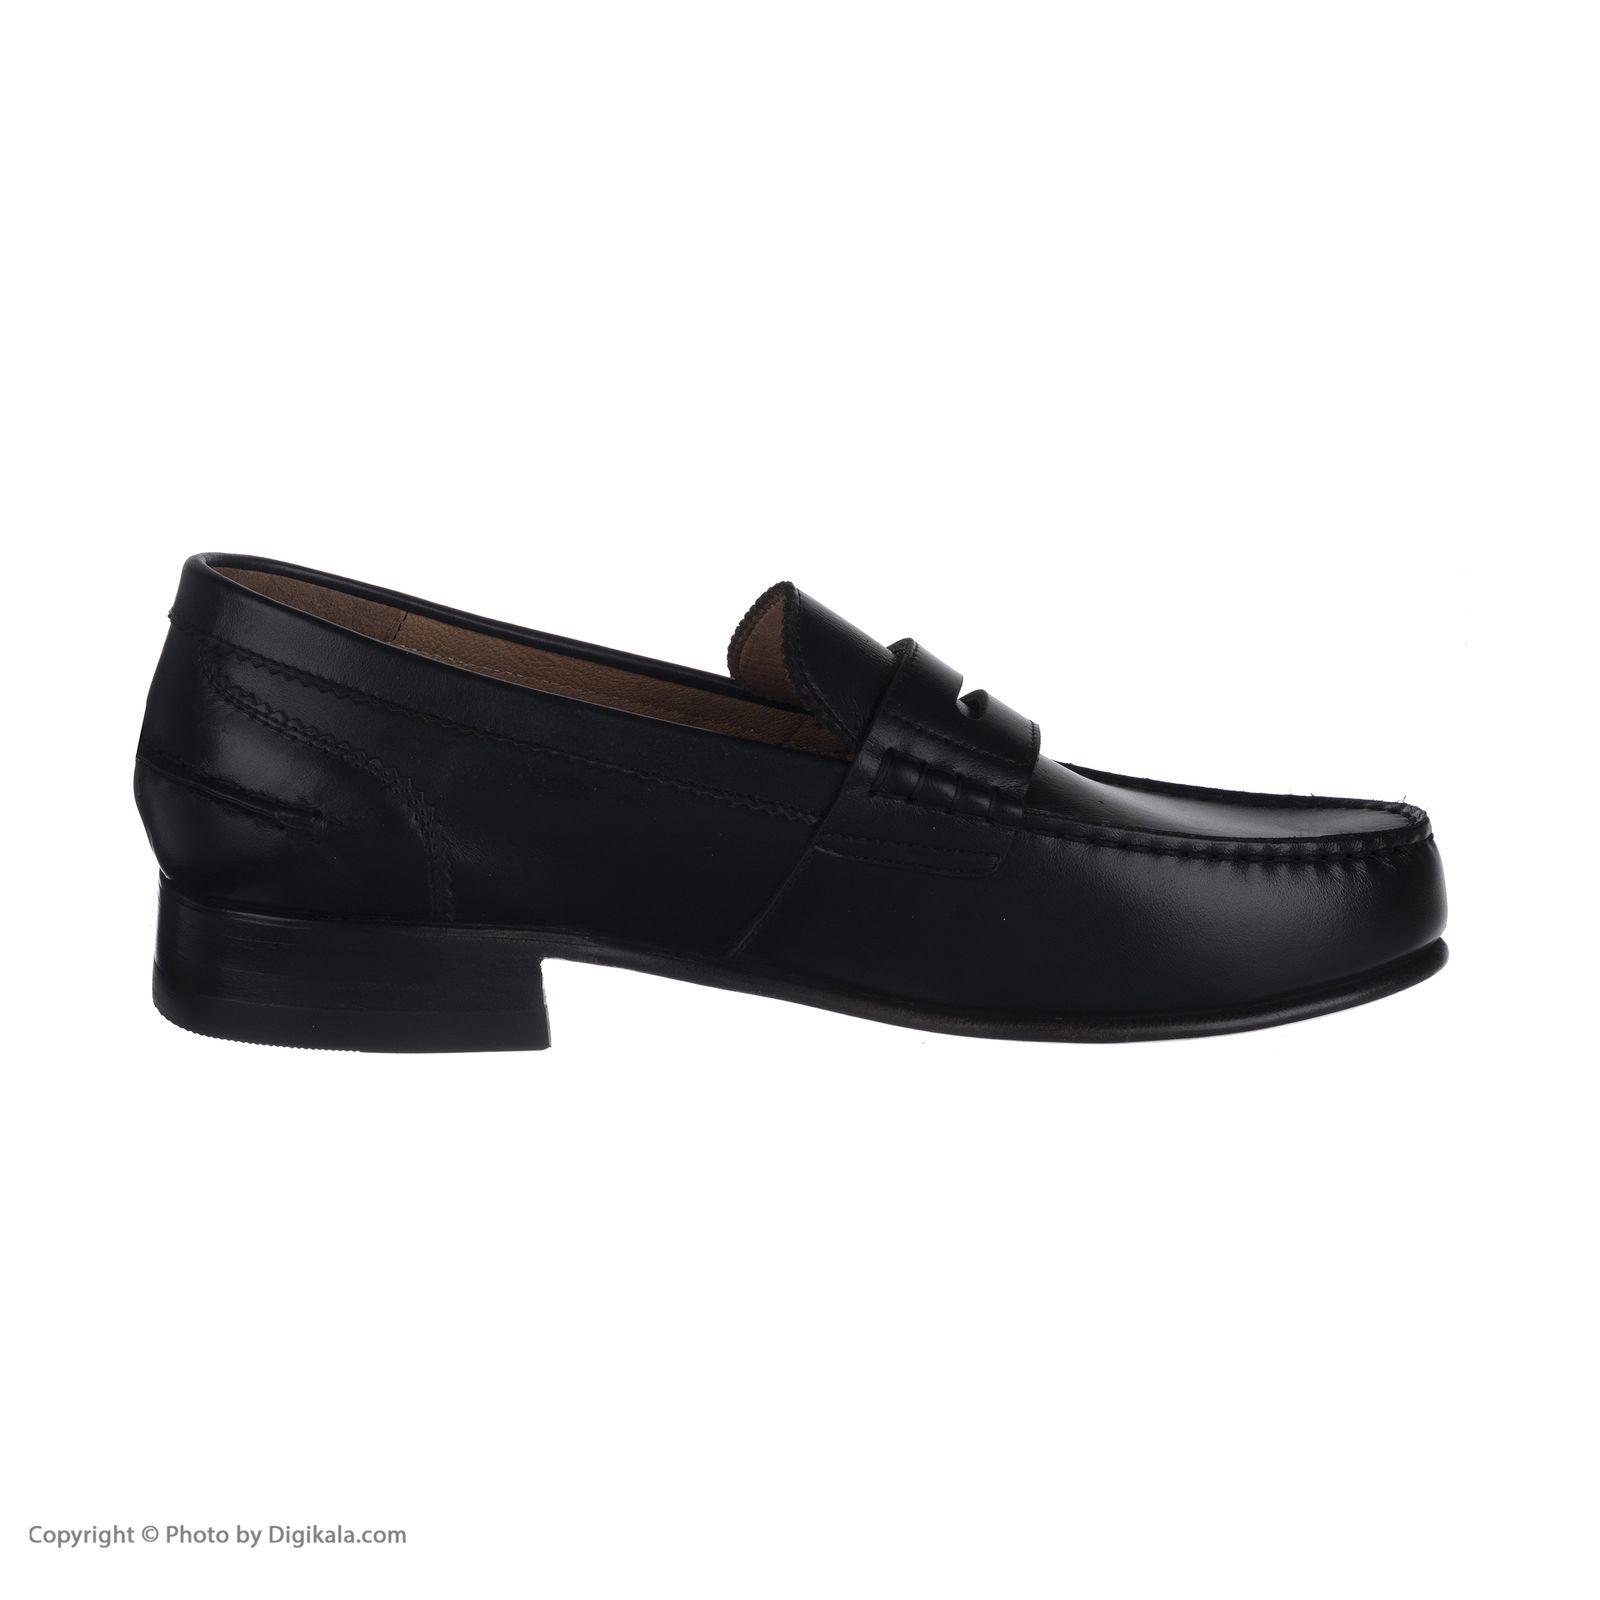 کفش مردانه نظری کد 410 -  - 5